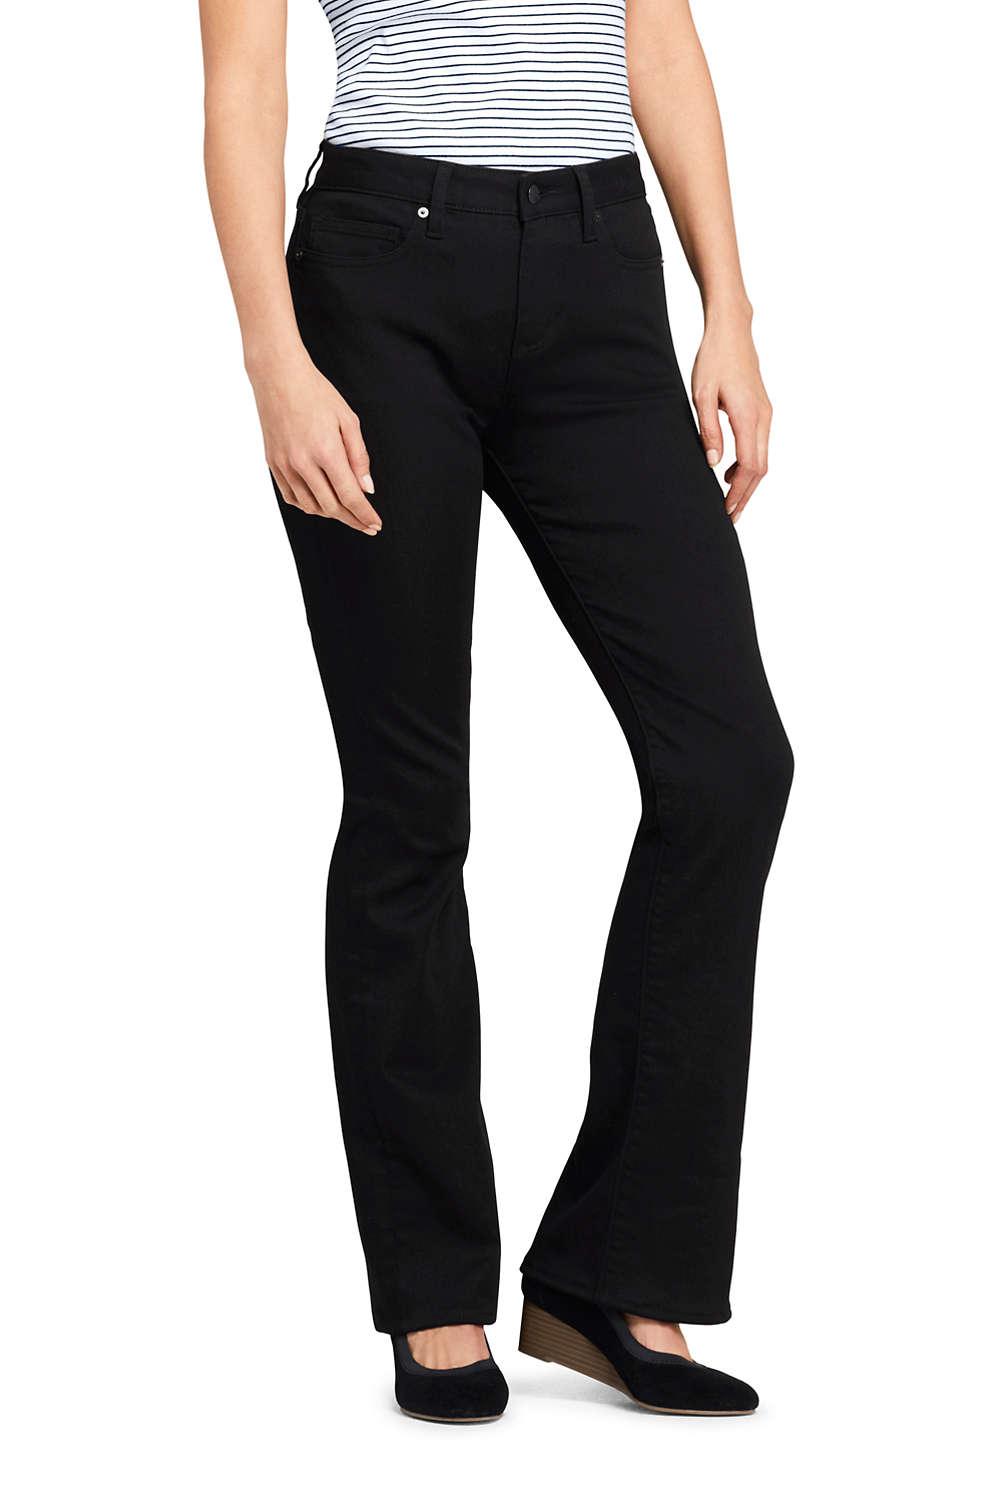 b2408dea5edc8c Women's Mid Rise Curvy Boot Cut Black Jeans from Lands' End